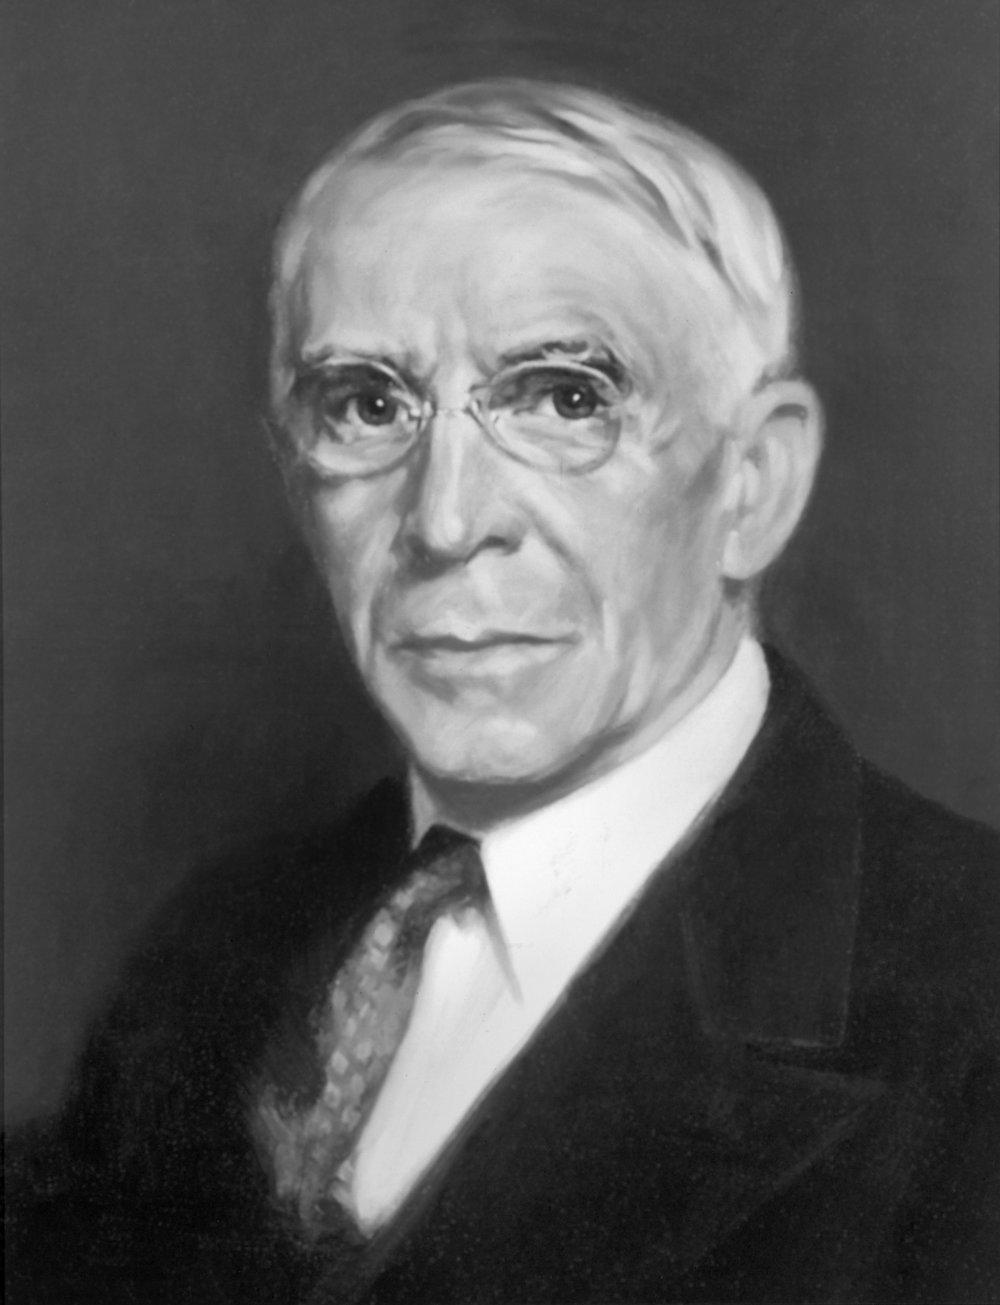 2-GEORGE A. MARTIN.jpg